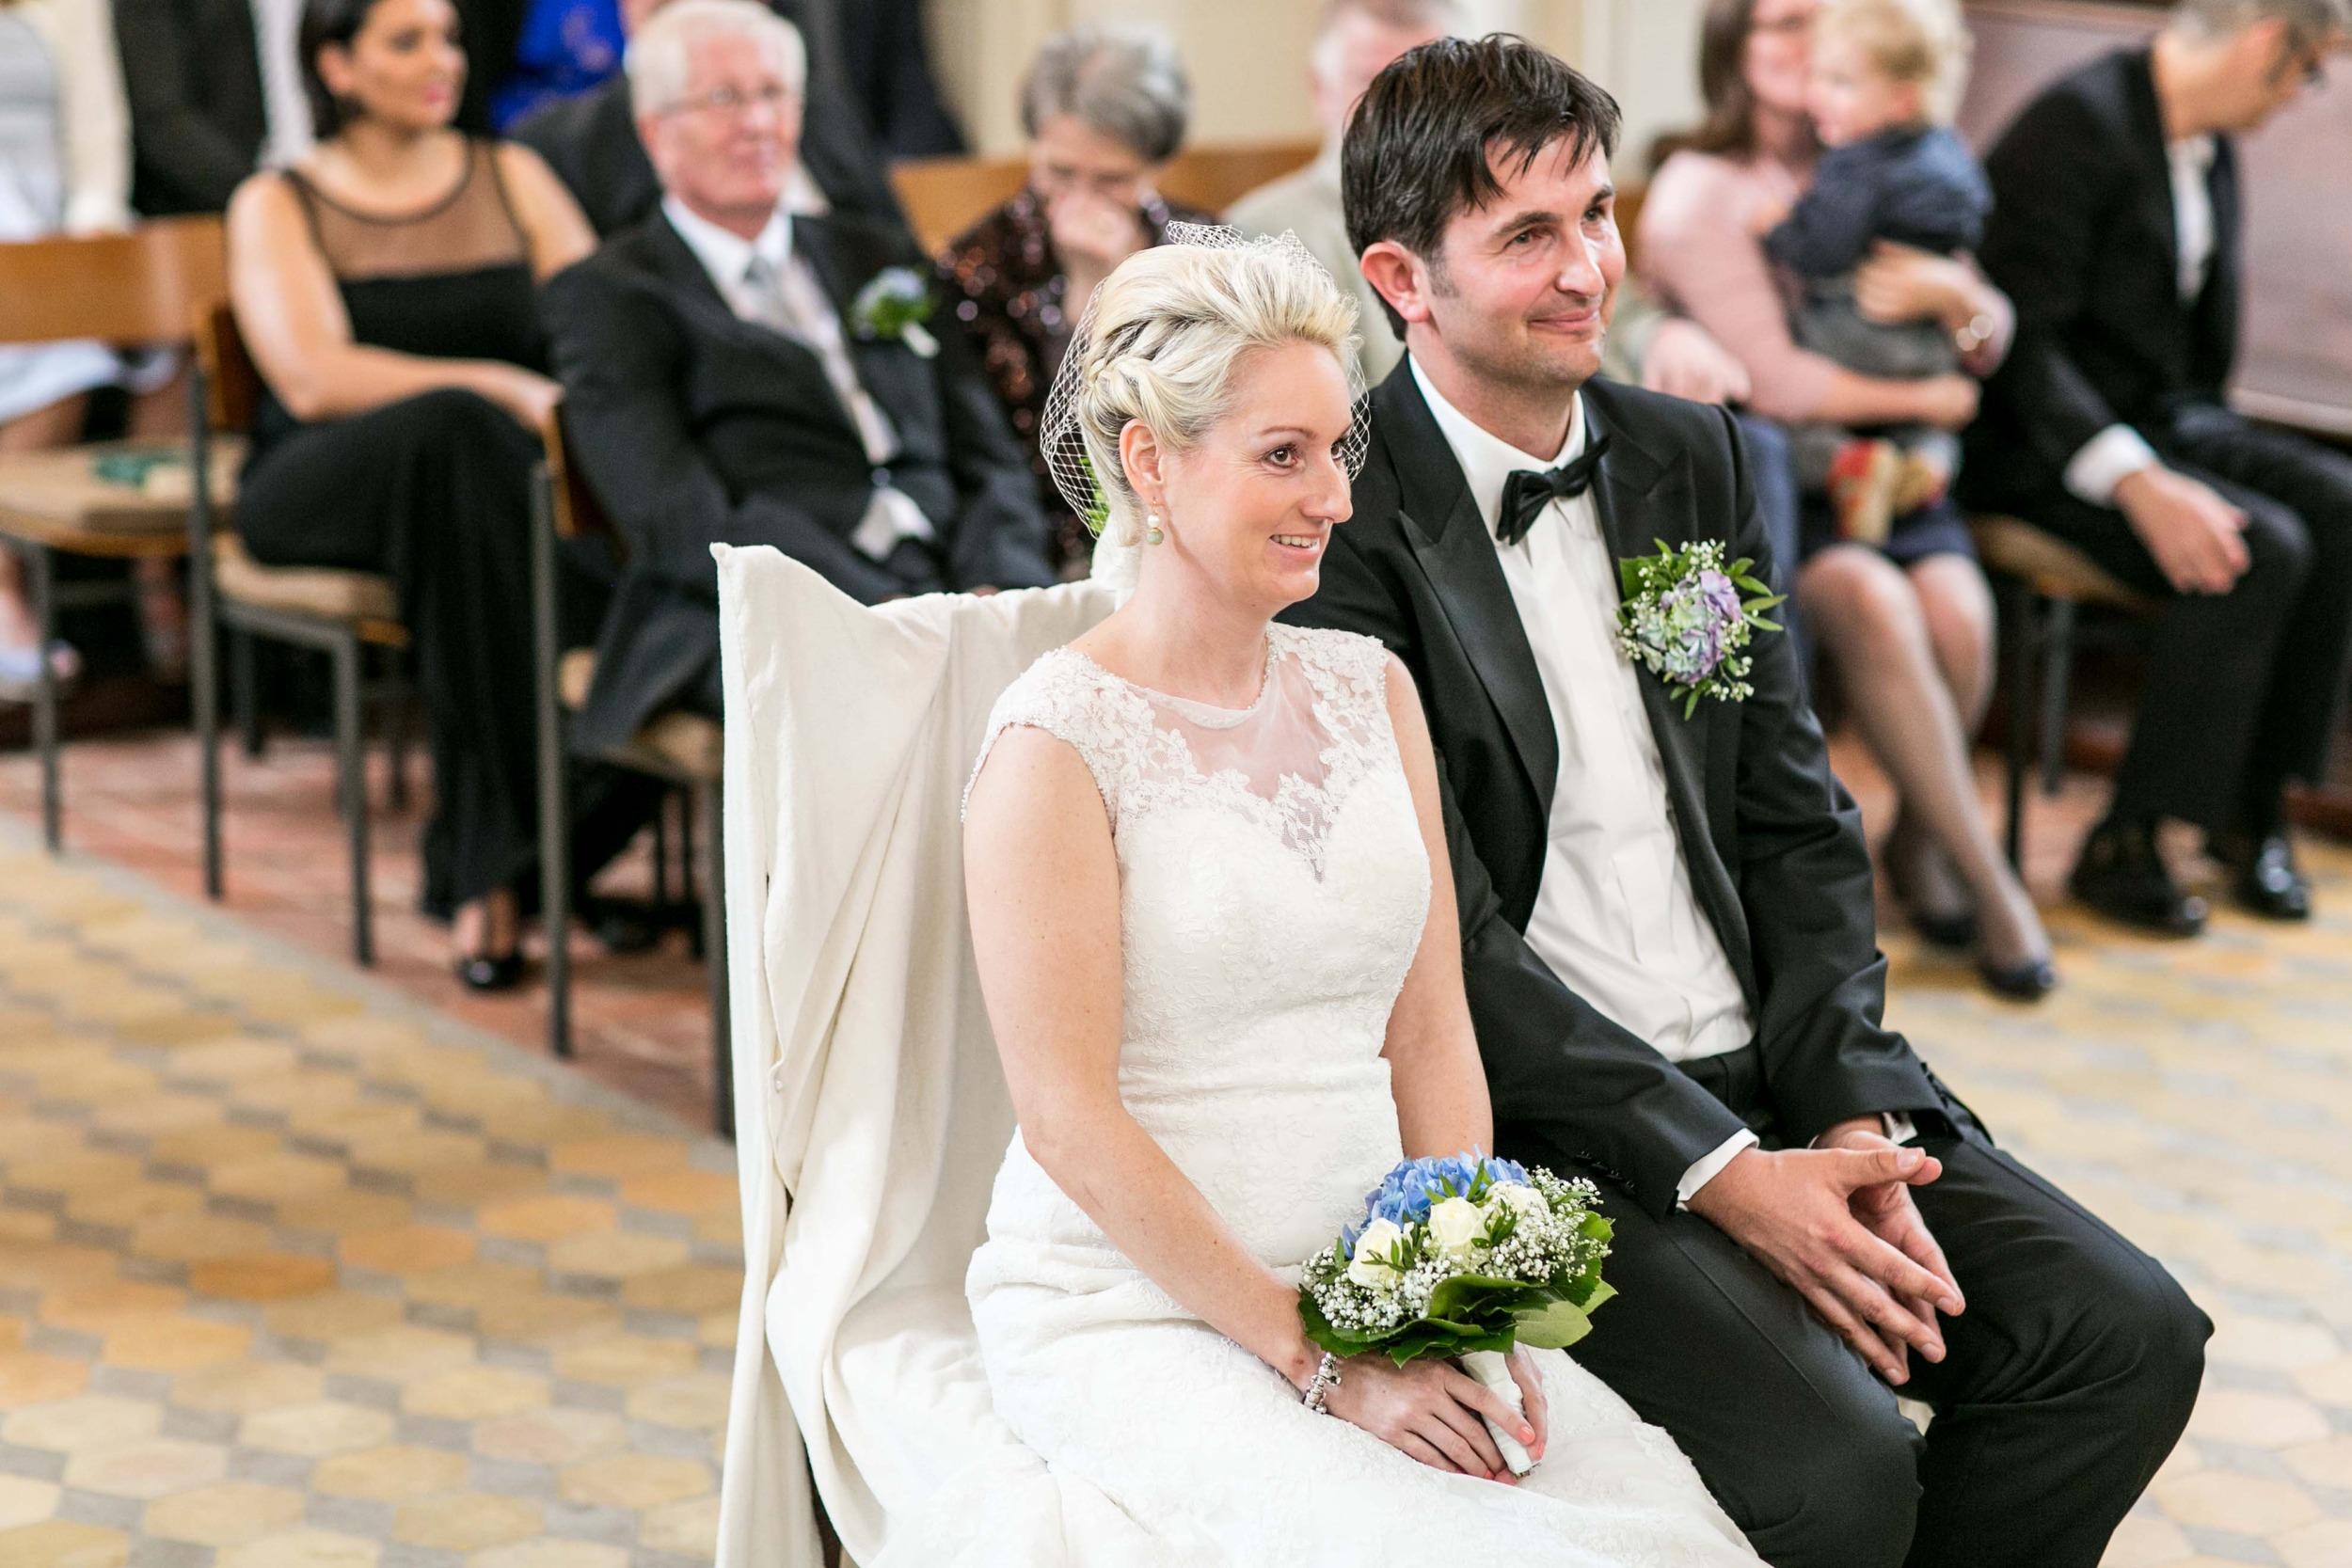 Hochzeitsfotografie Berlin_Fran Burrows Fotografie_15.jpg